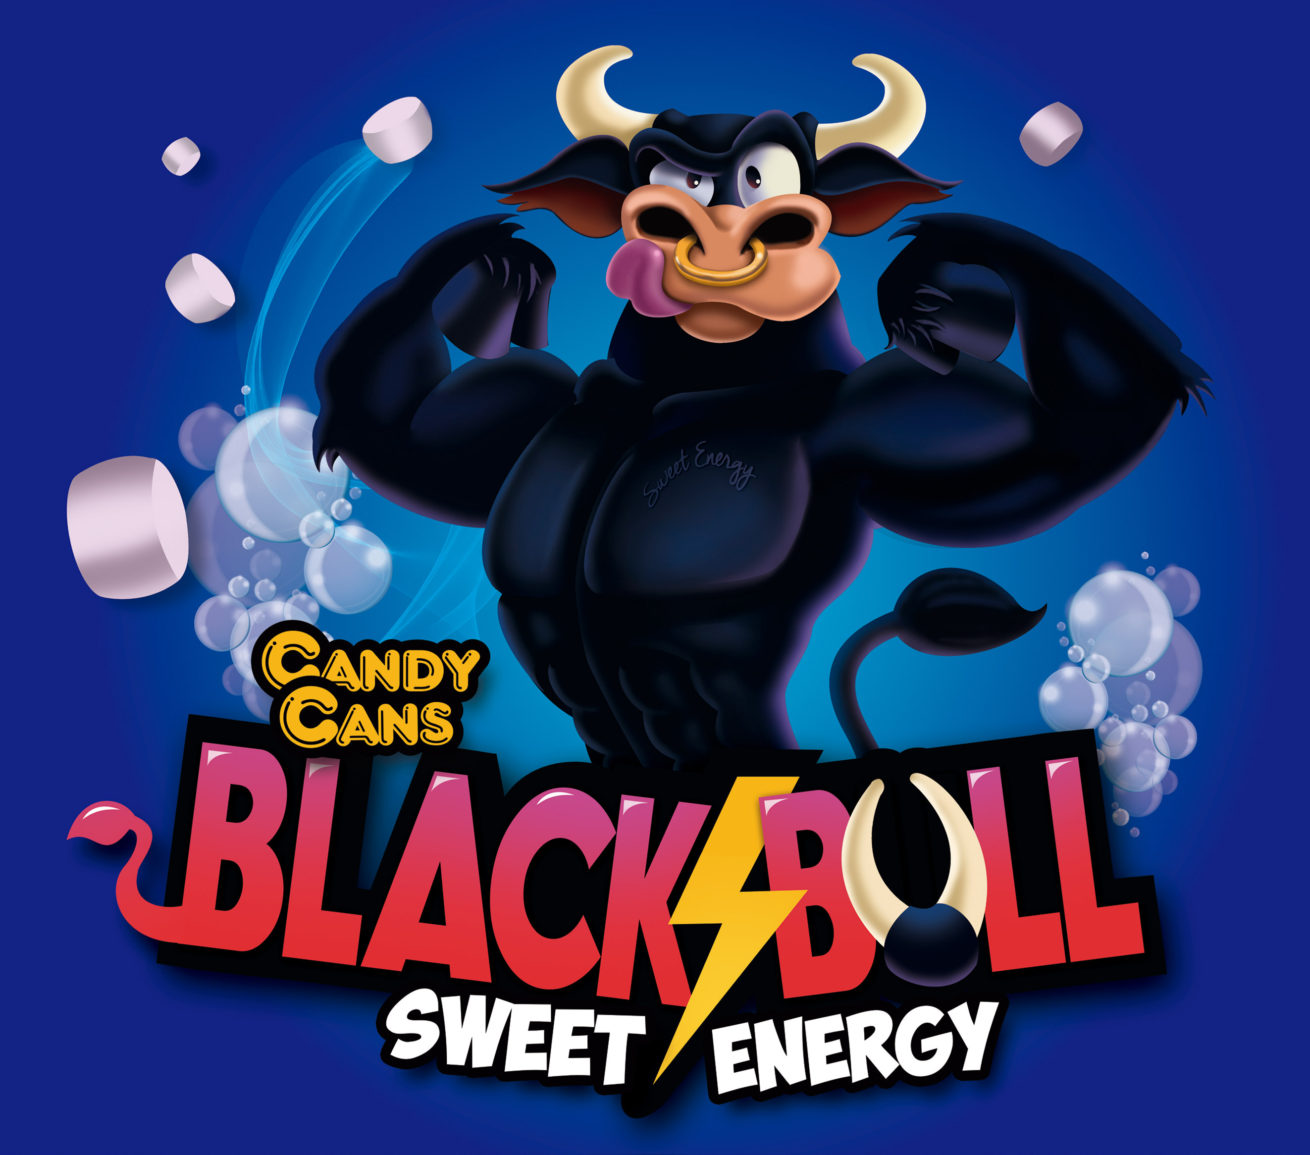 BlackBull - Poster - Juan Ángel Ortiz